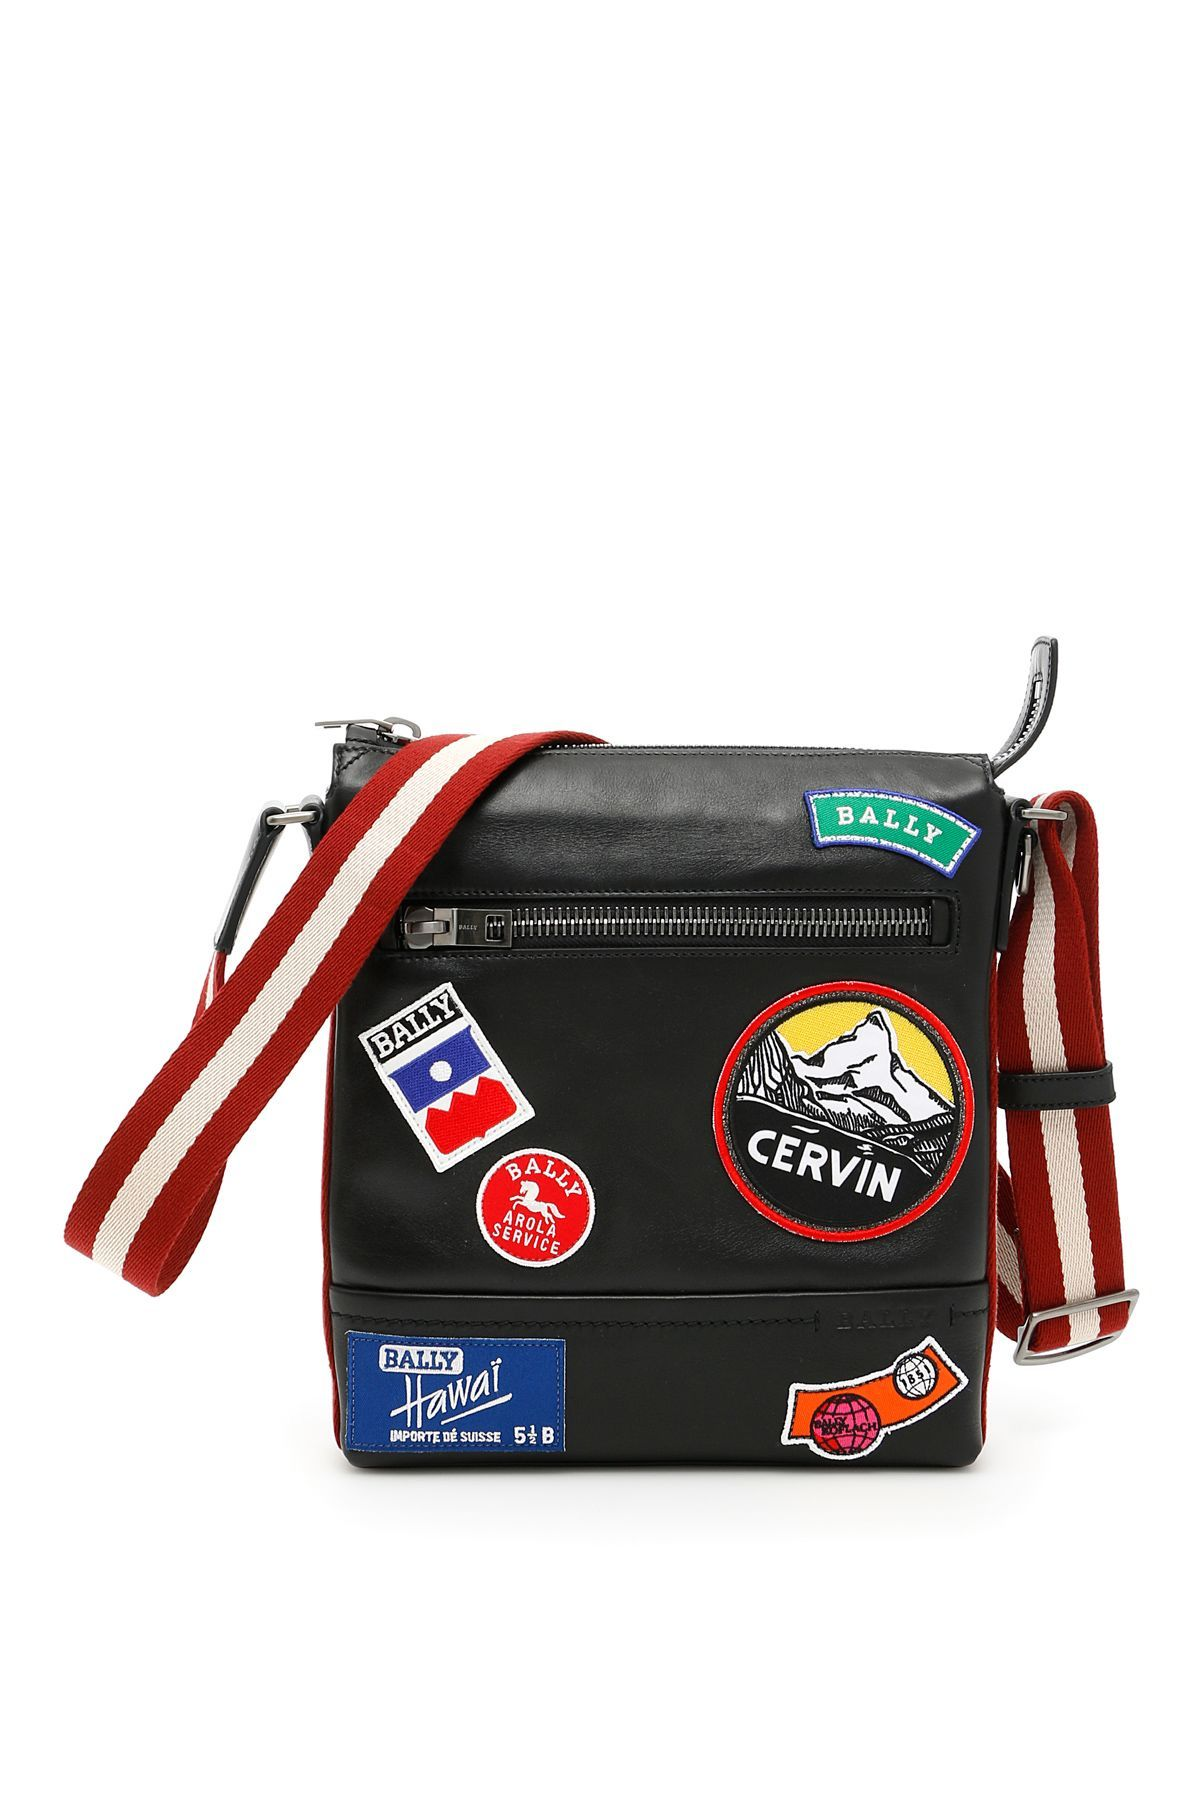 8a2707cdc3 BALLY TREZZINI BAG.  bally  bags  shoulder bags  lining